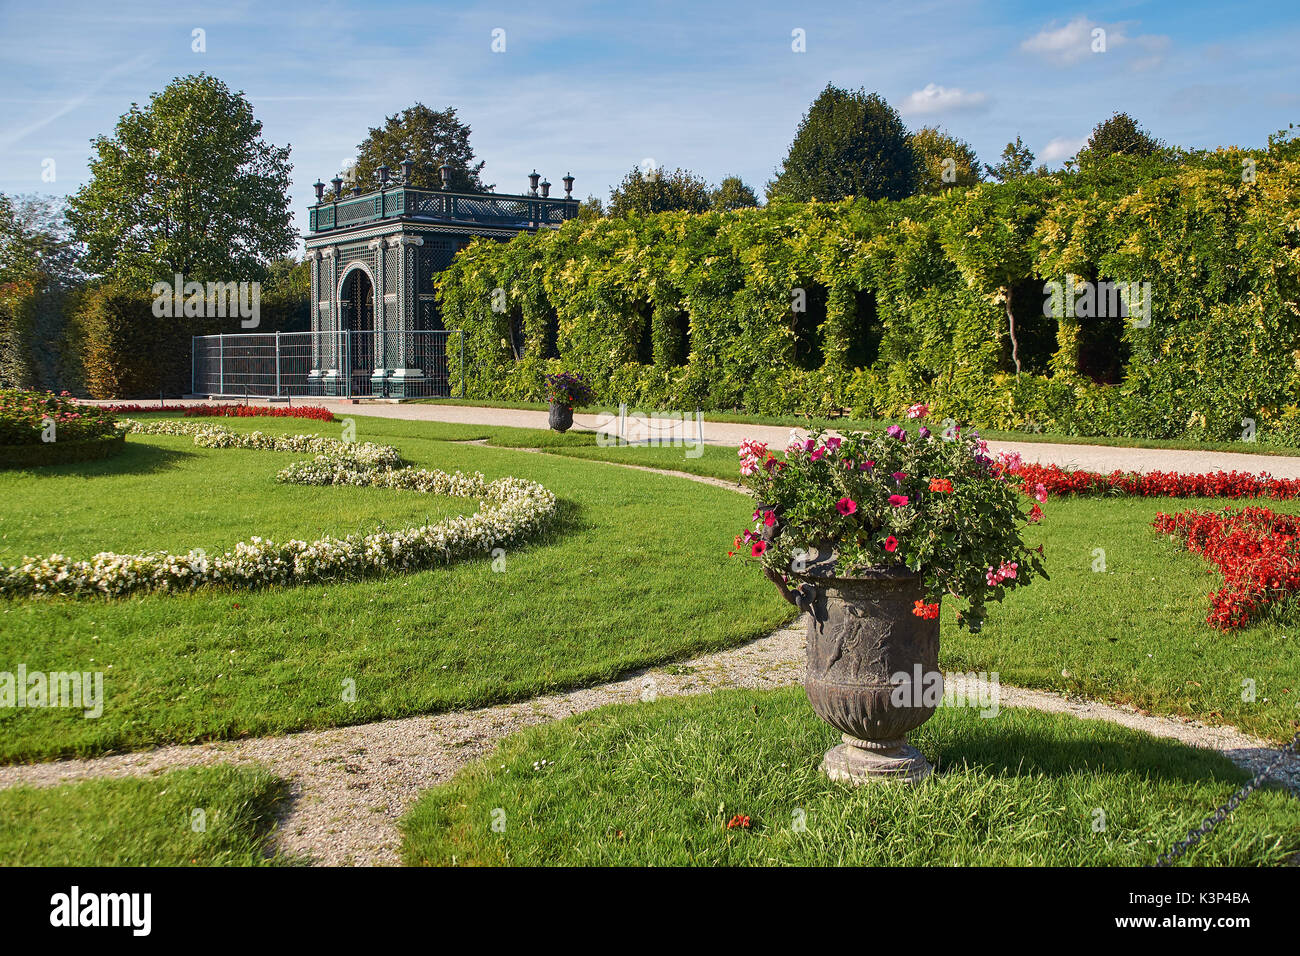 Vienna, Austria - September 24, 2014: Garden house near Schonbrunn palace in Vienna Stock Photo